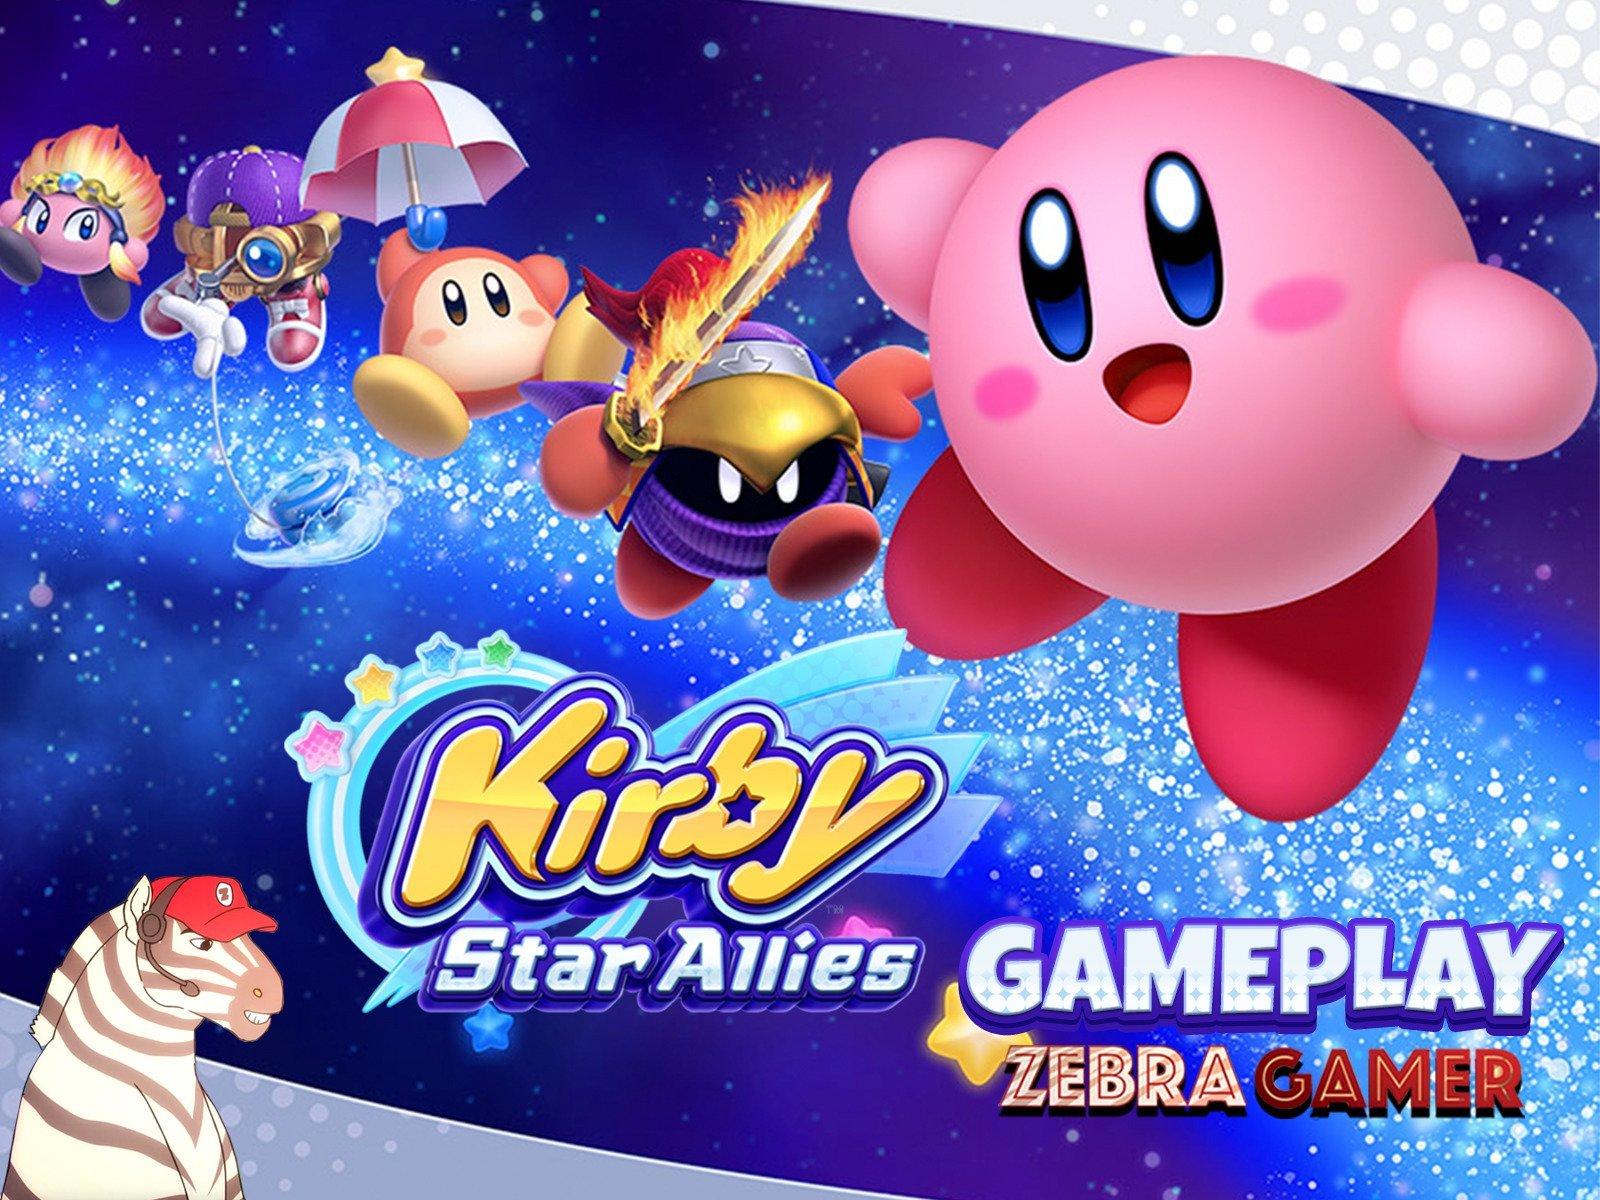 Clip: Kirby Star Allies Gameplay - Zebra Gamer - Season 1